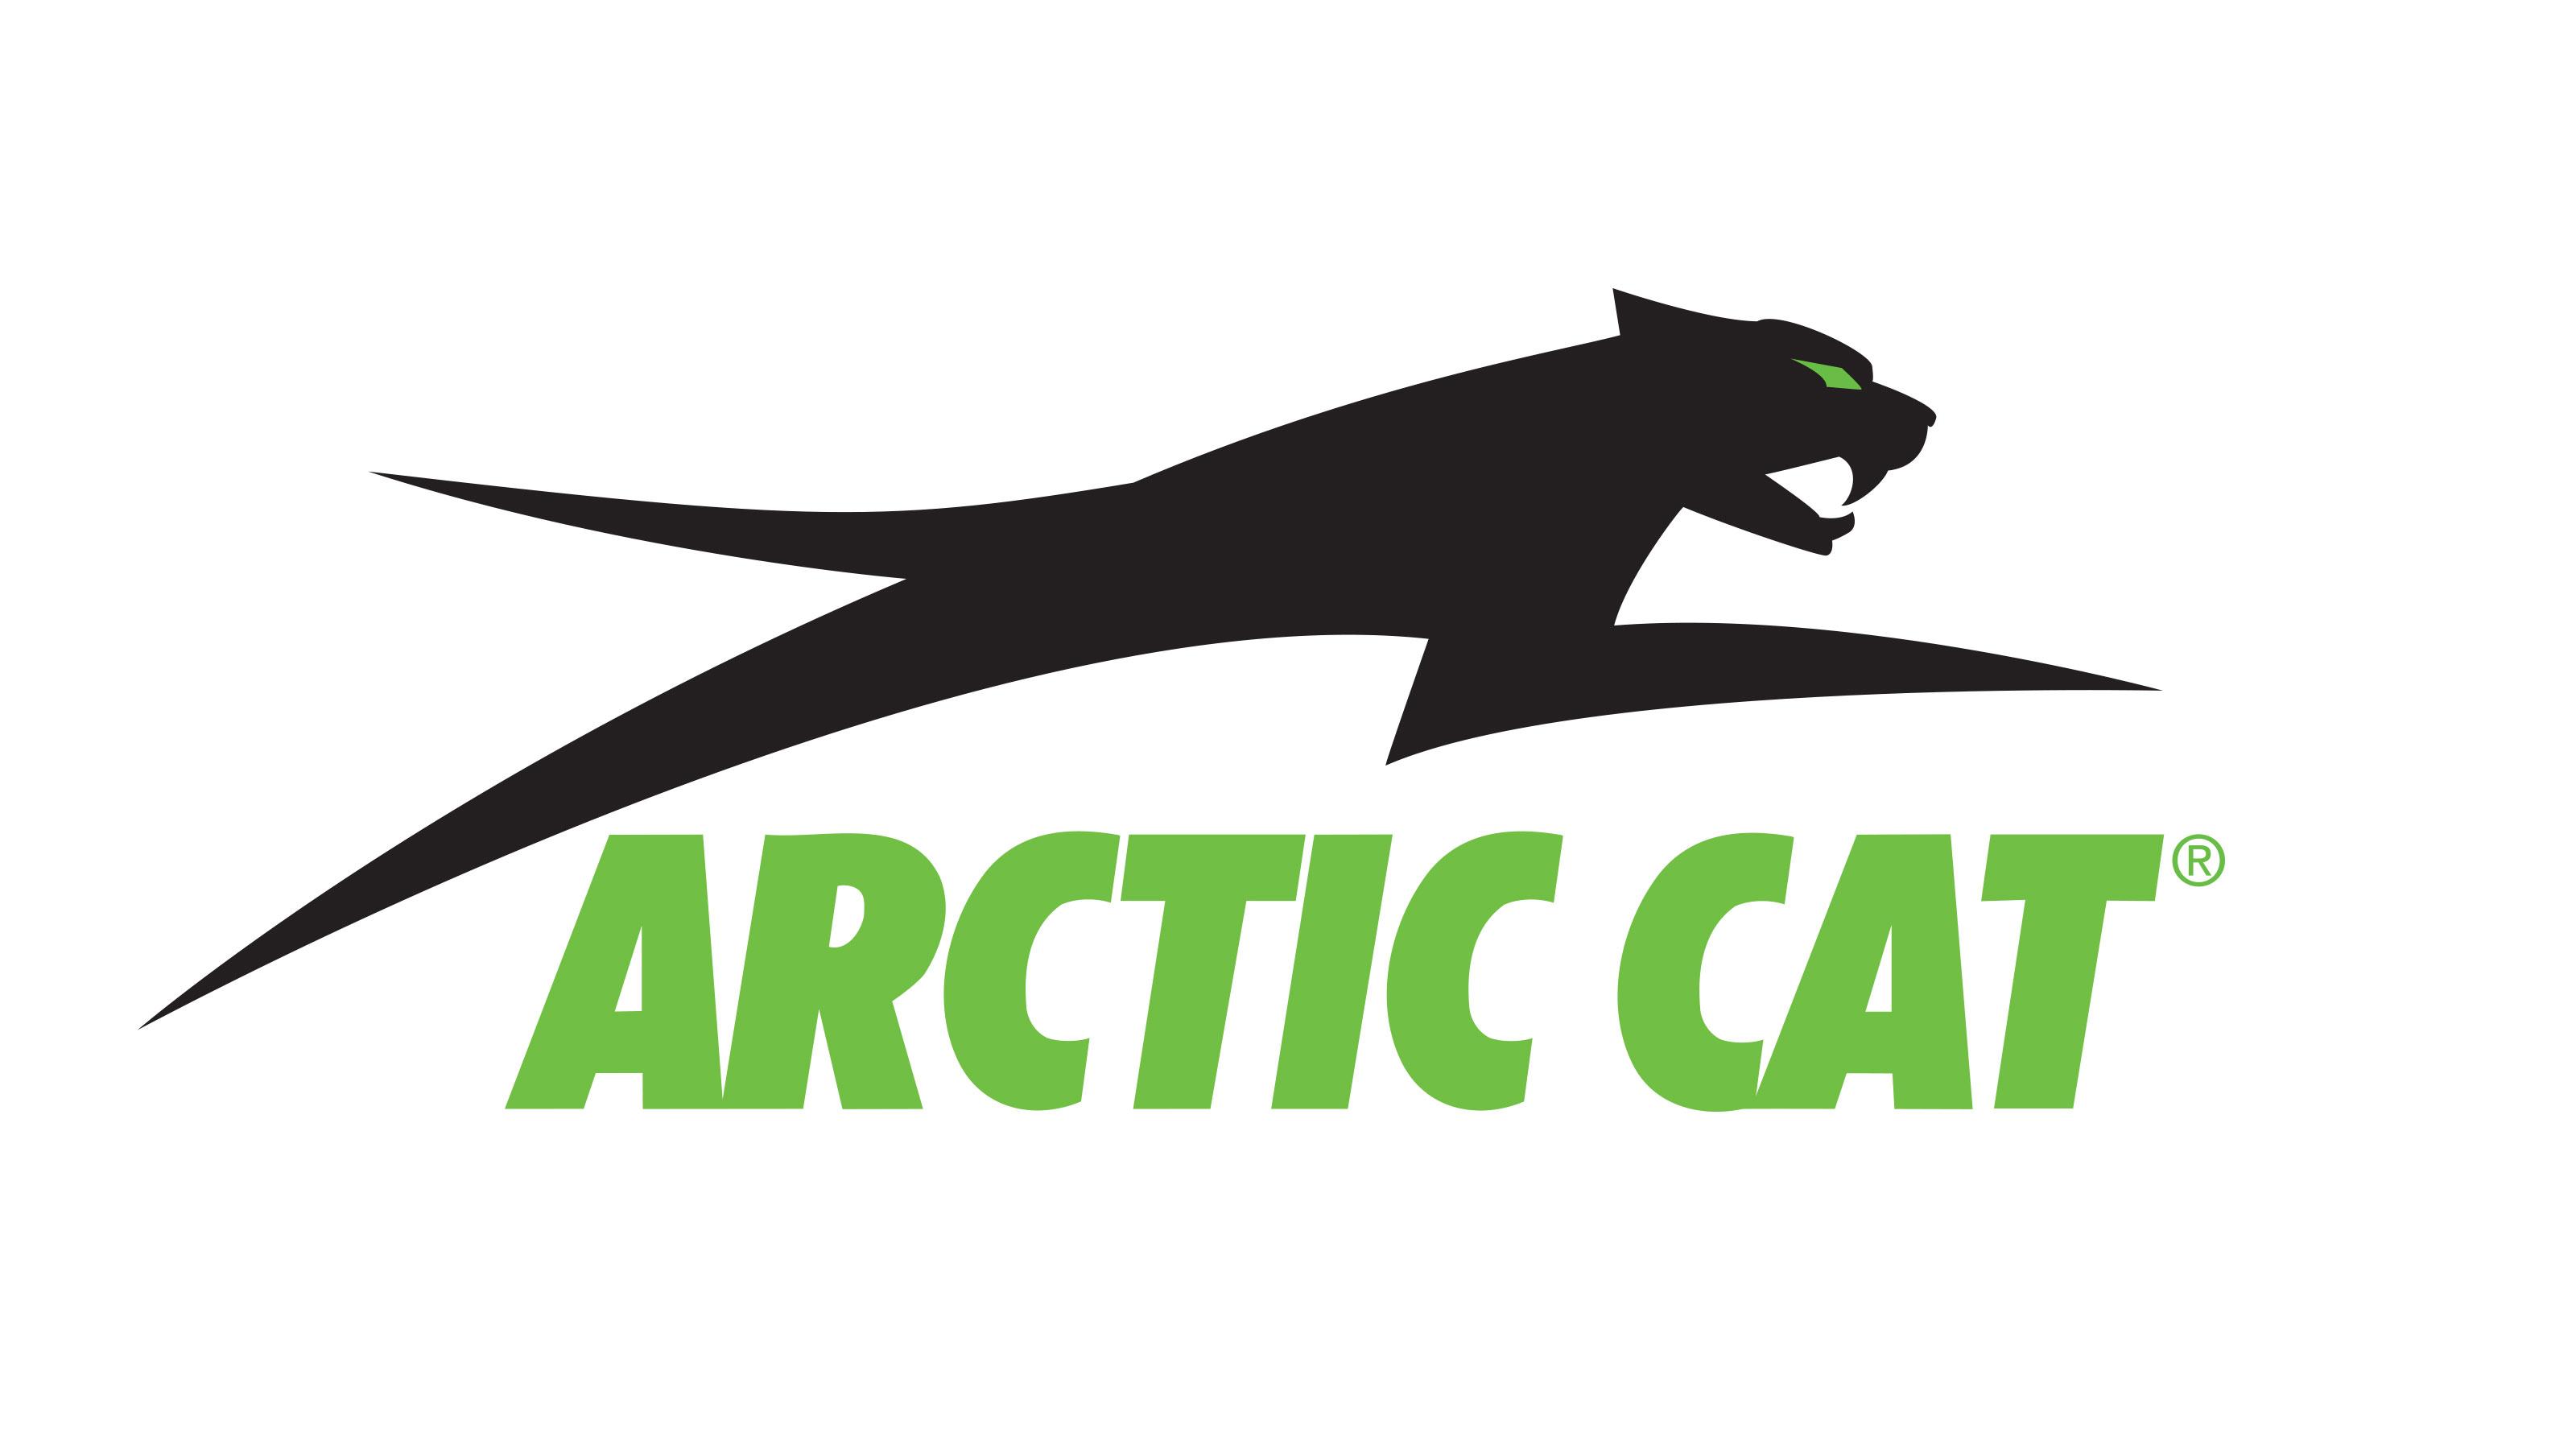 ArcticCatLogo_V2.jpg